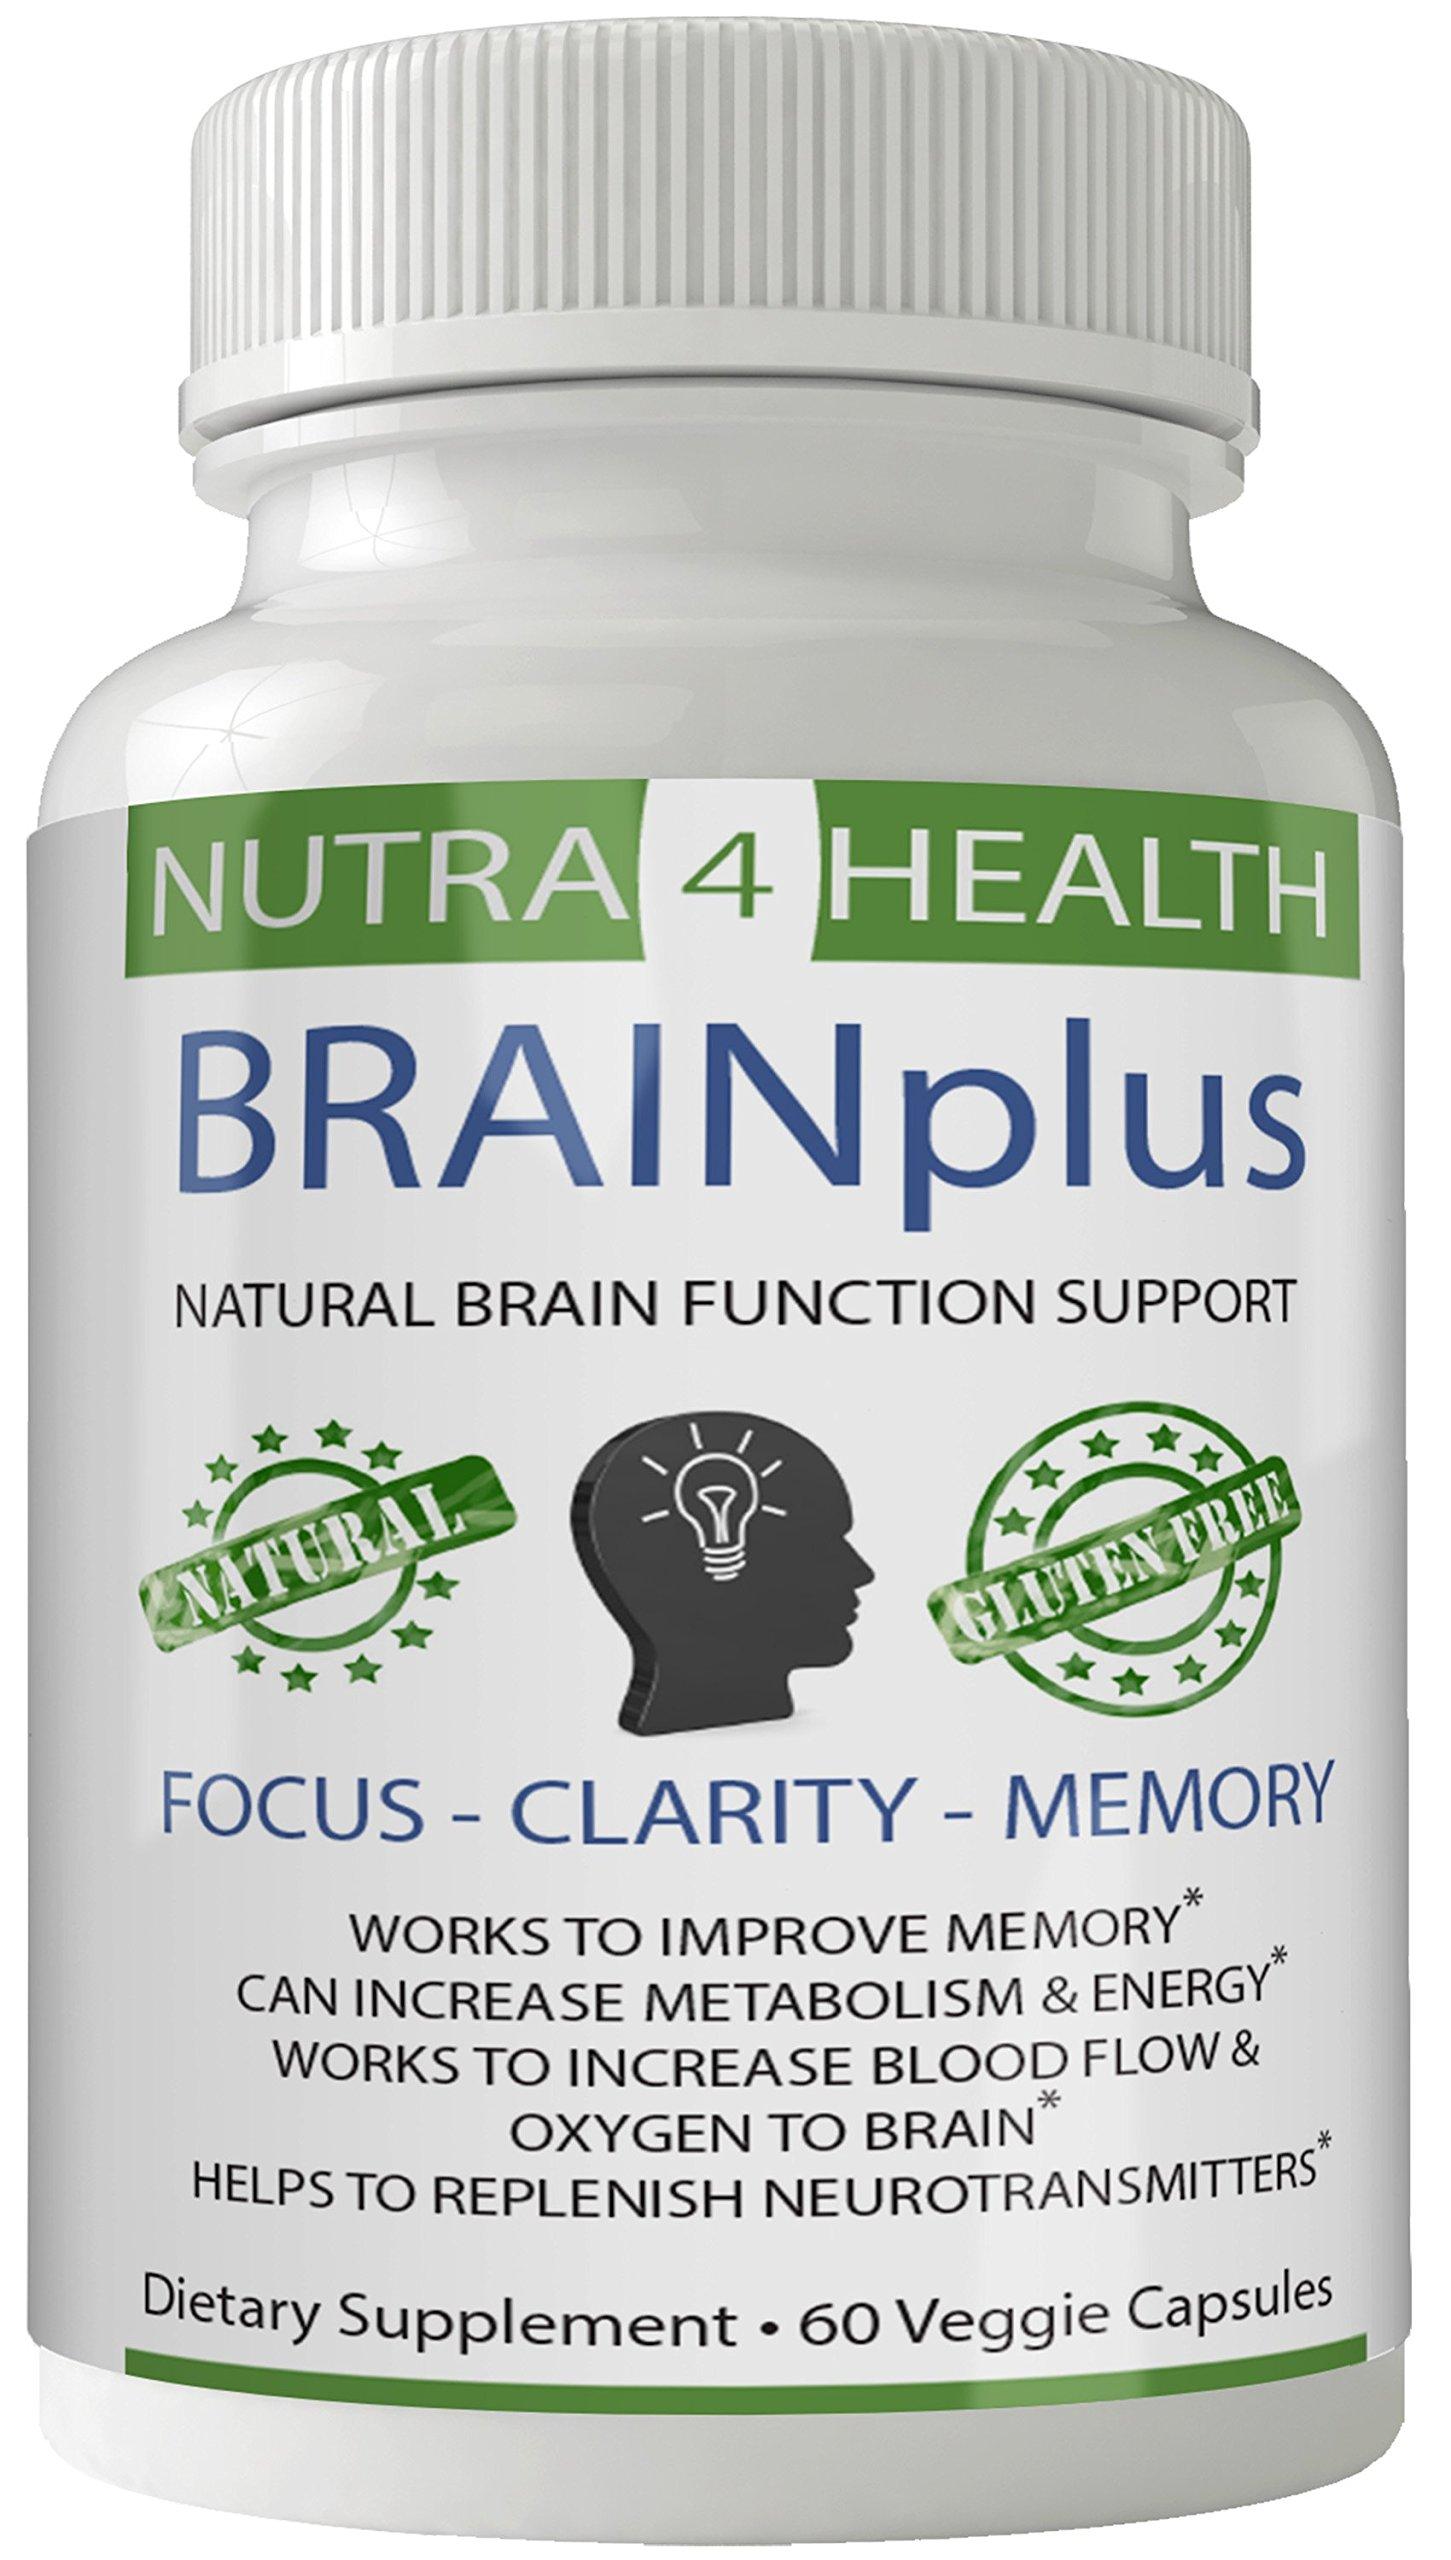 BRAINplus - Brain IQ Plus Capsules for Brain Plus IQ Original from nutra4health, Brain Booster, Brain Supplement for FOCUS, CLARITY and MEMORY NEW FORMULA 2018